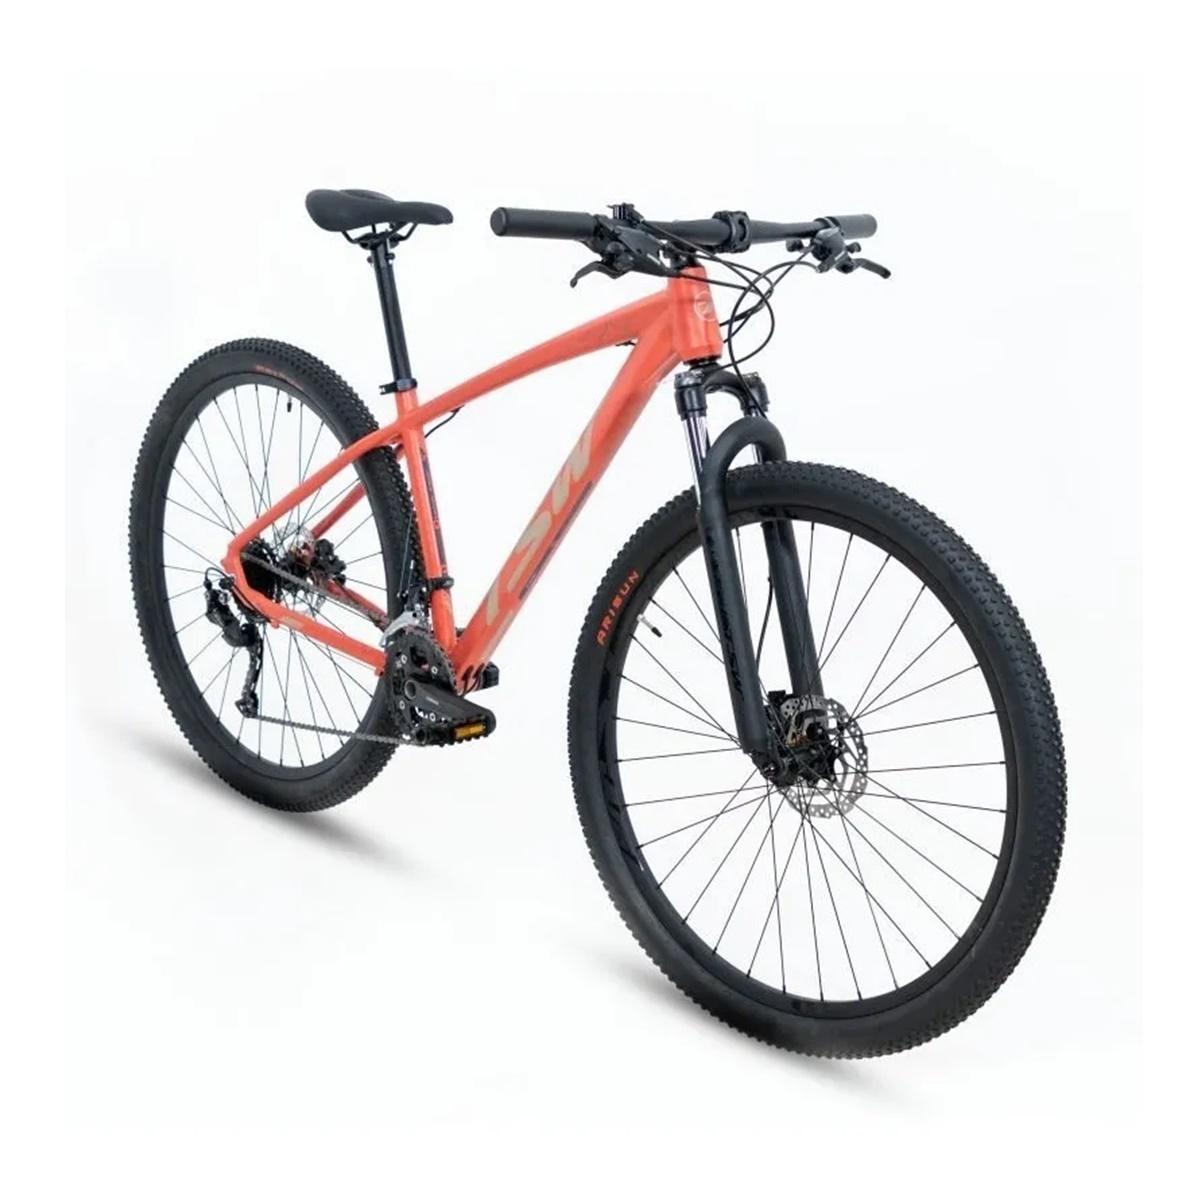 Bicicleta TSW Hunch Plus | 2021/2022 27 Velocidades Shimano Alivio